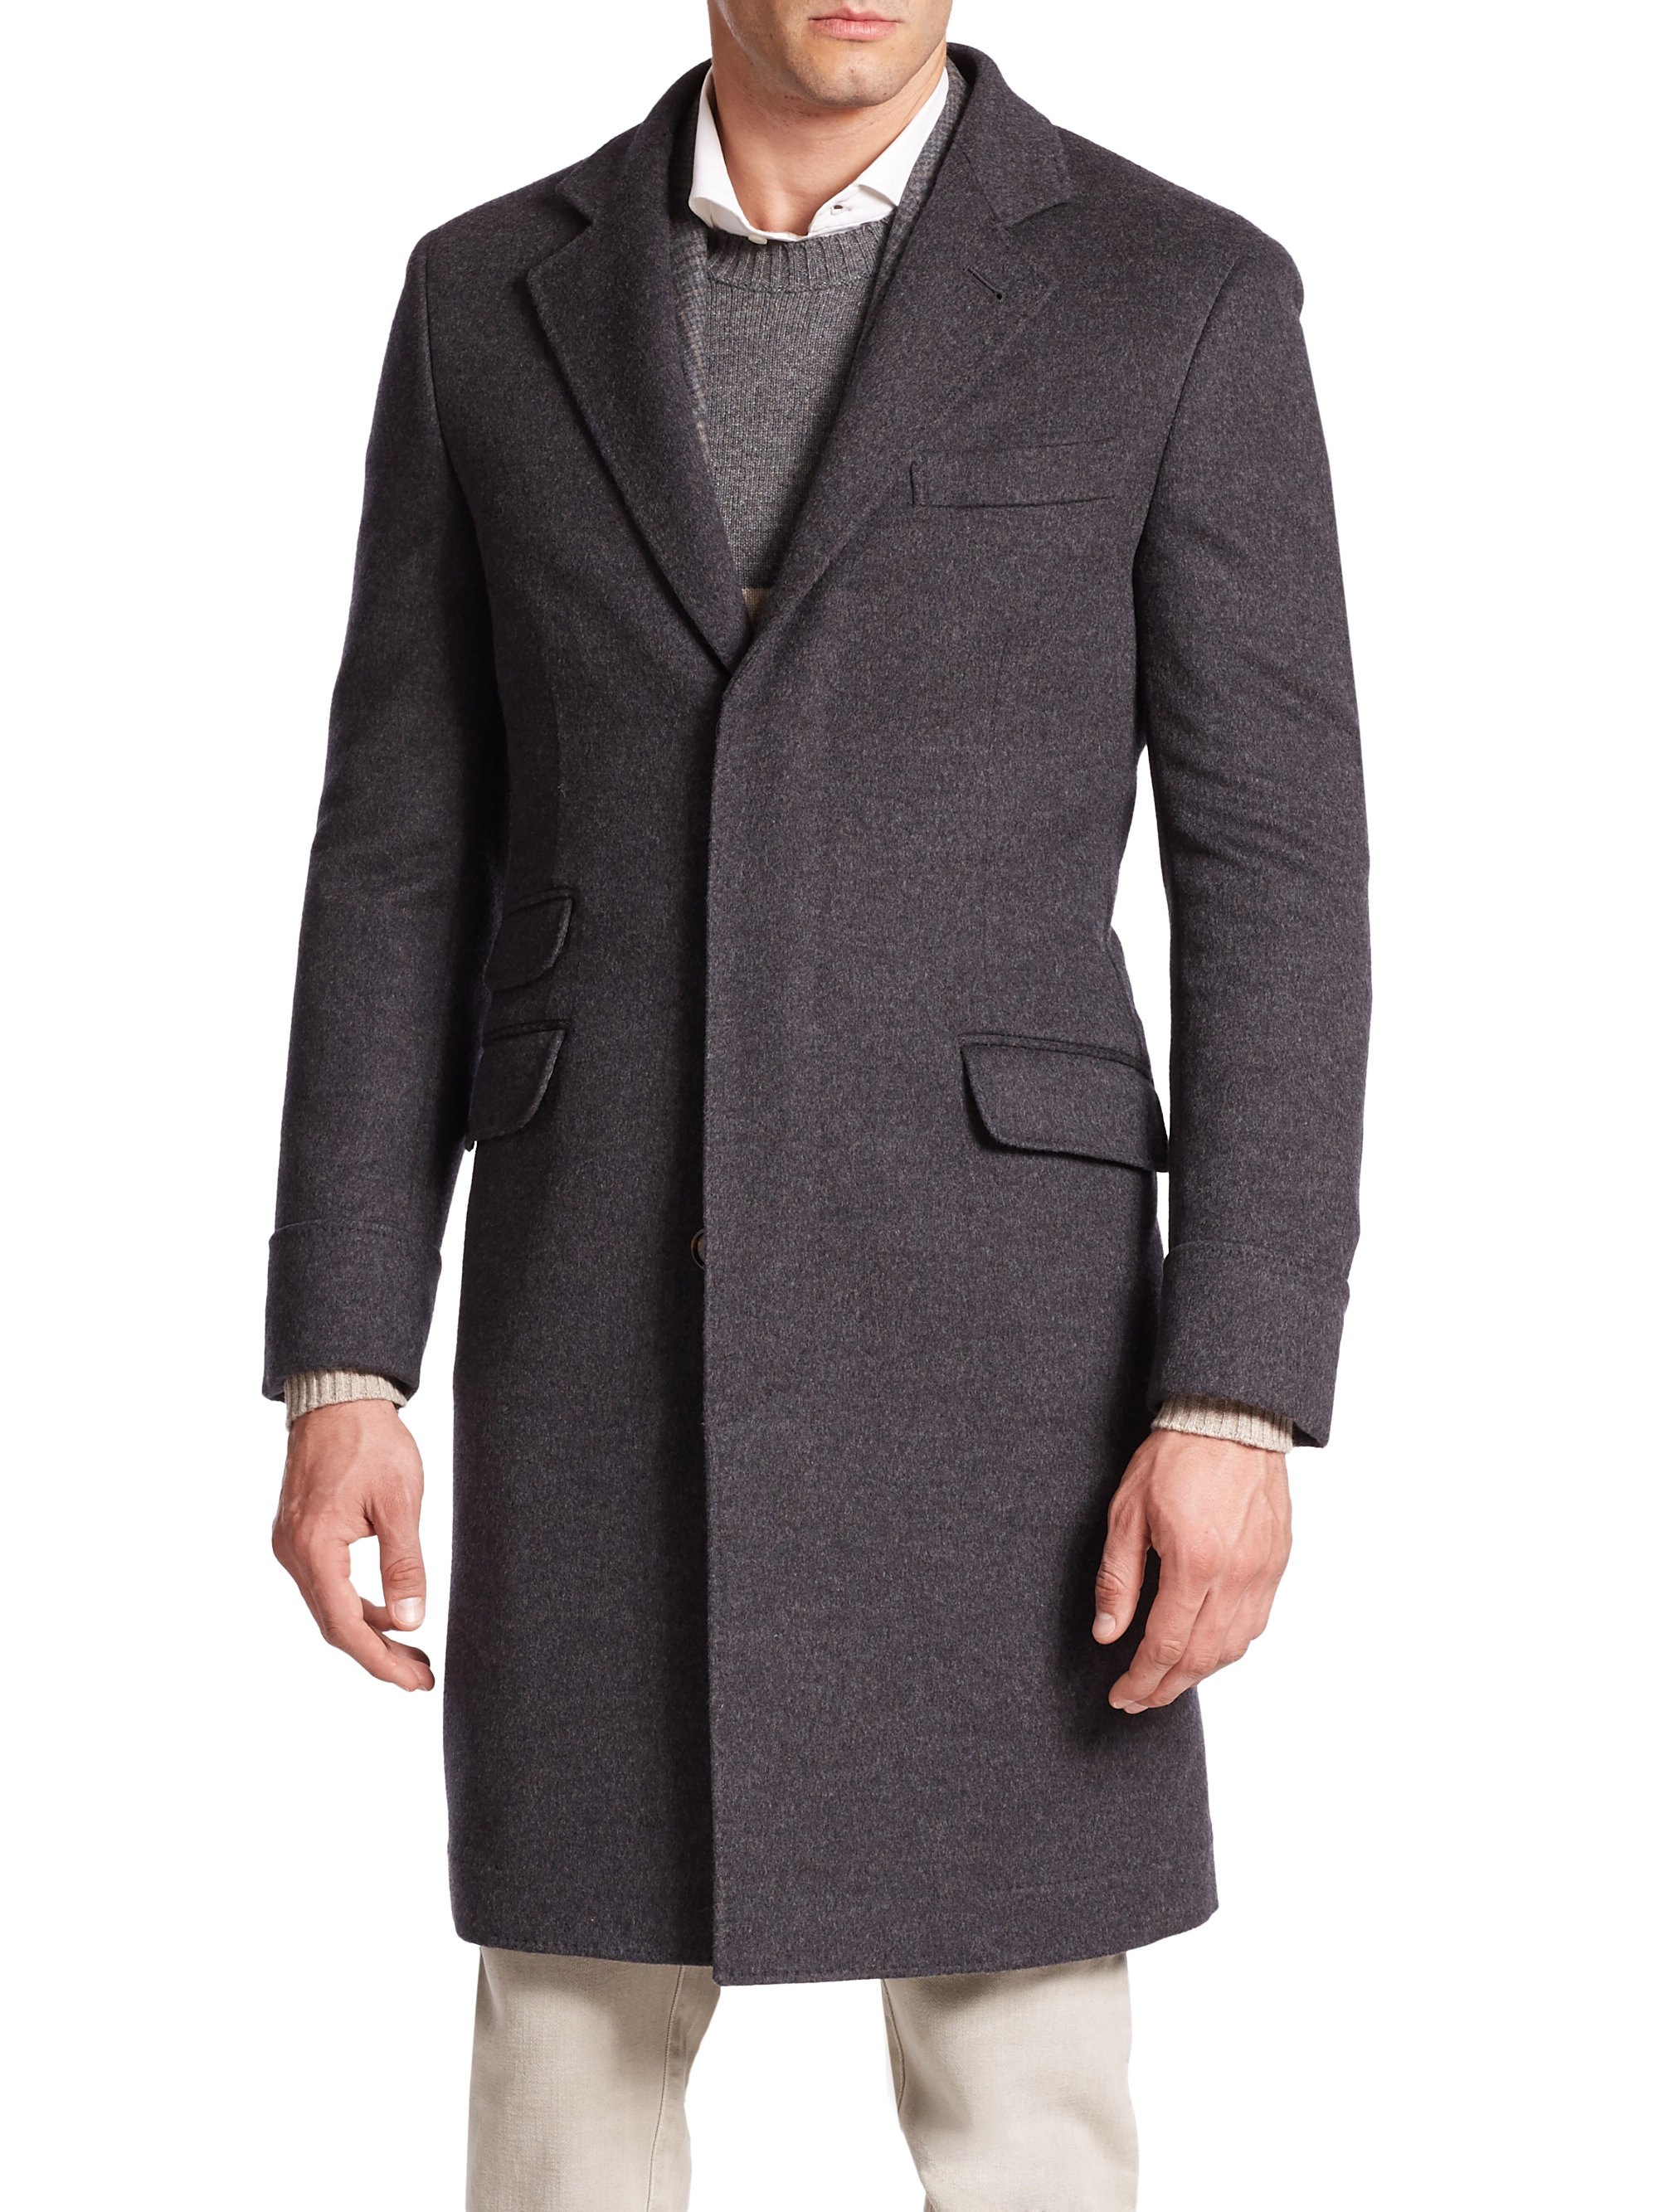 Mens gray overcoat